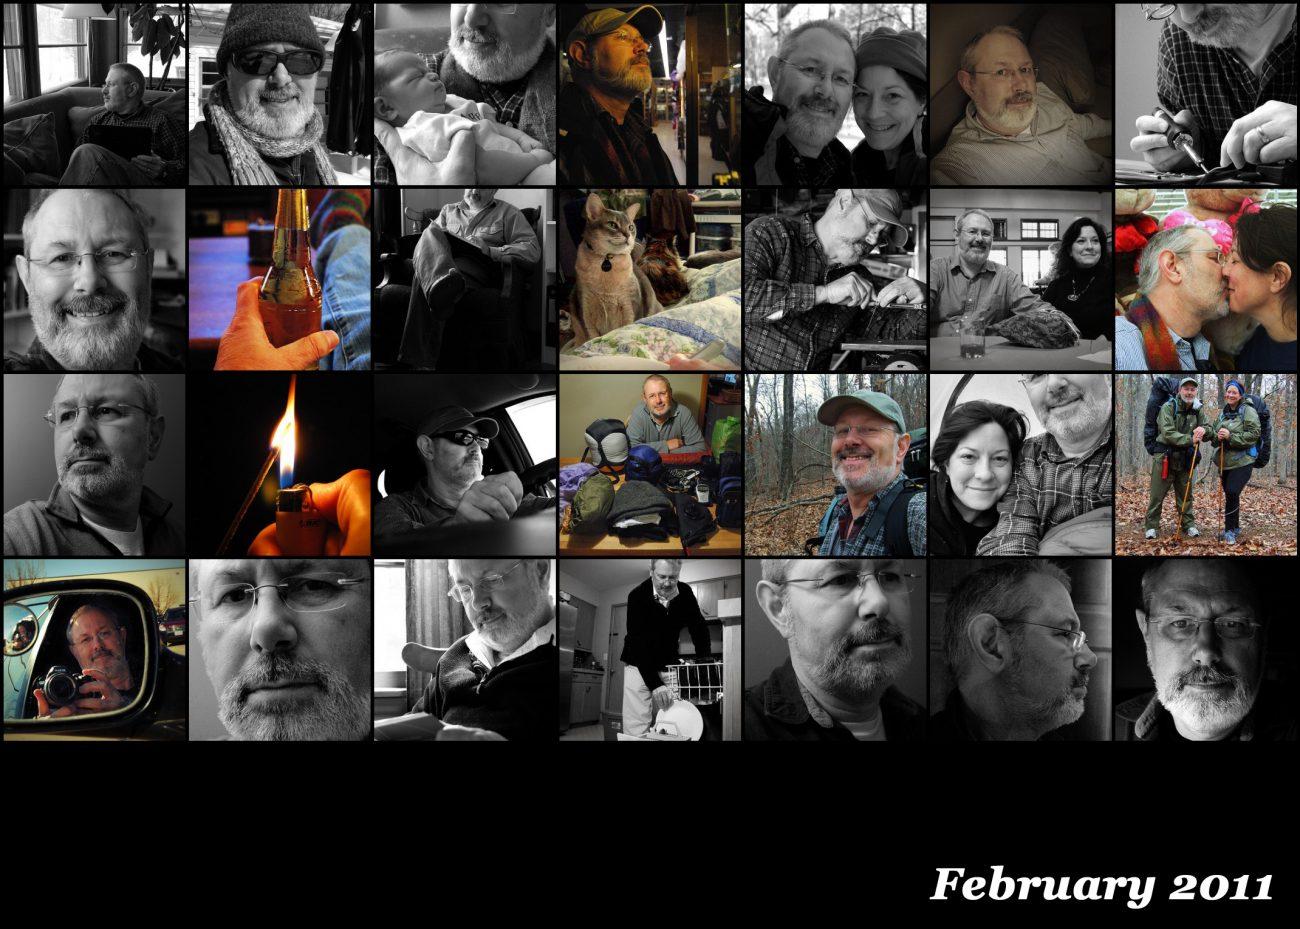 February summary by Gary Allman